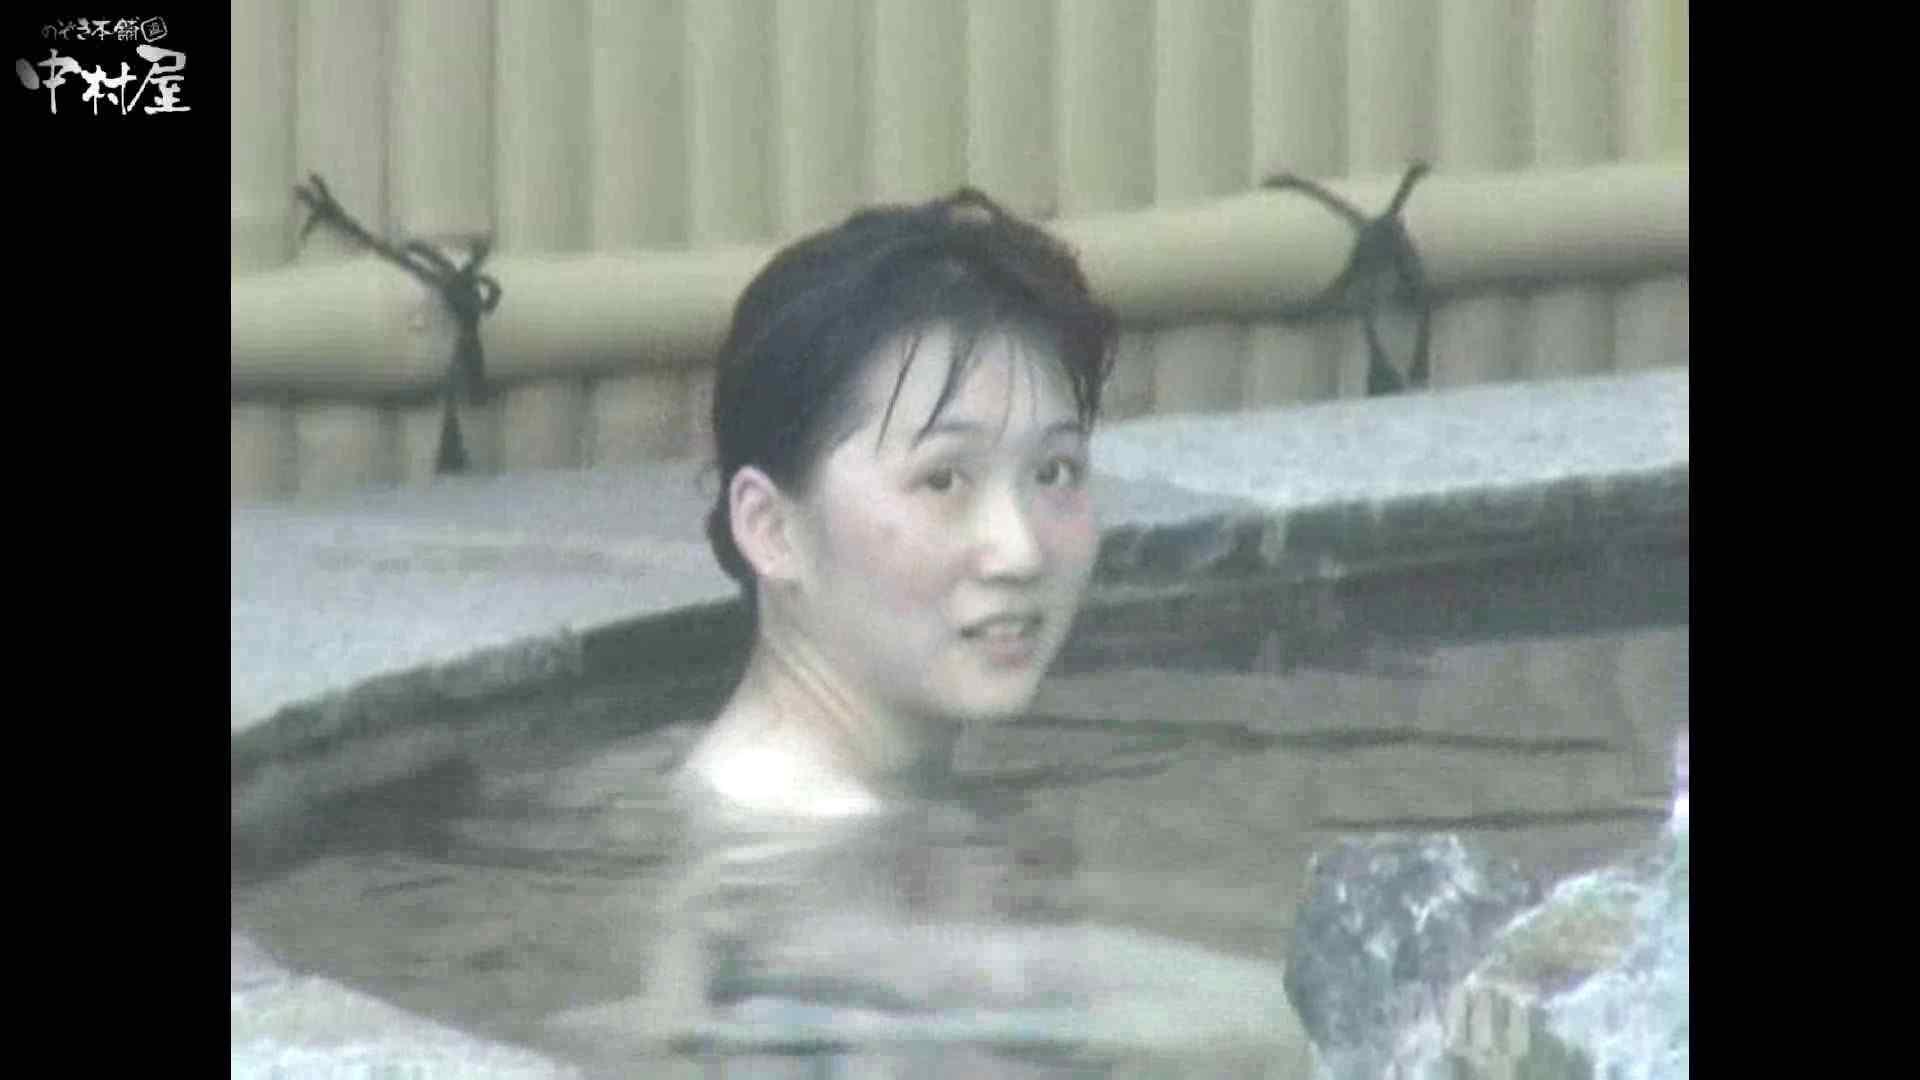 Aquaな露天風呂Vol.878潜入盗撮露天風呂十五判湯 其の一 露天 エロ画像 56連発 39